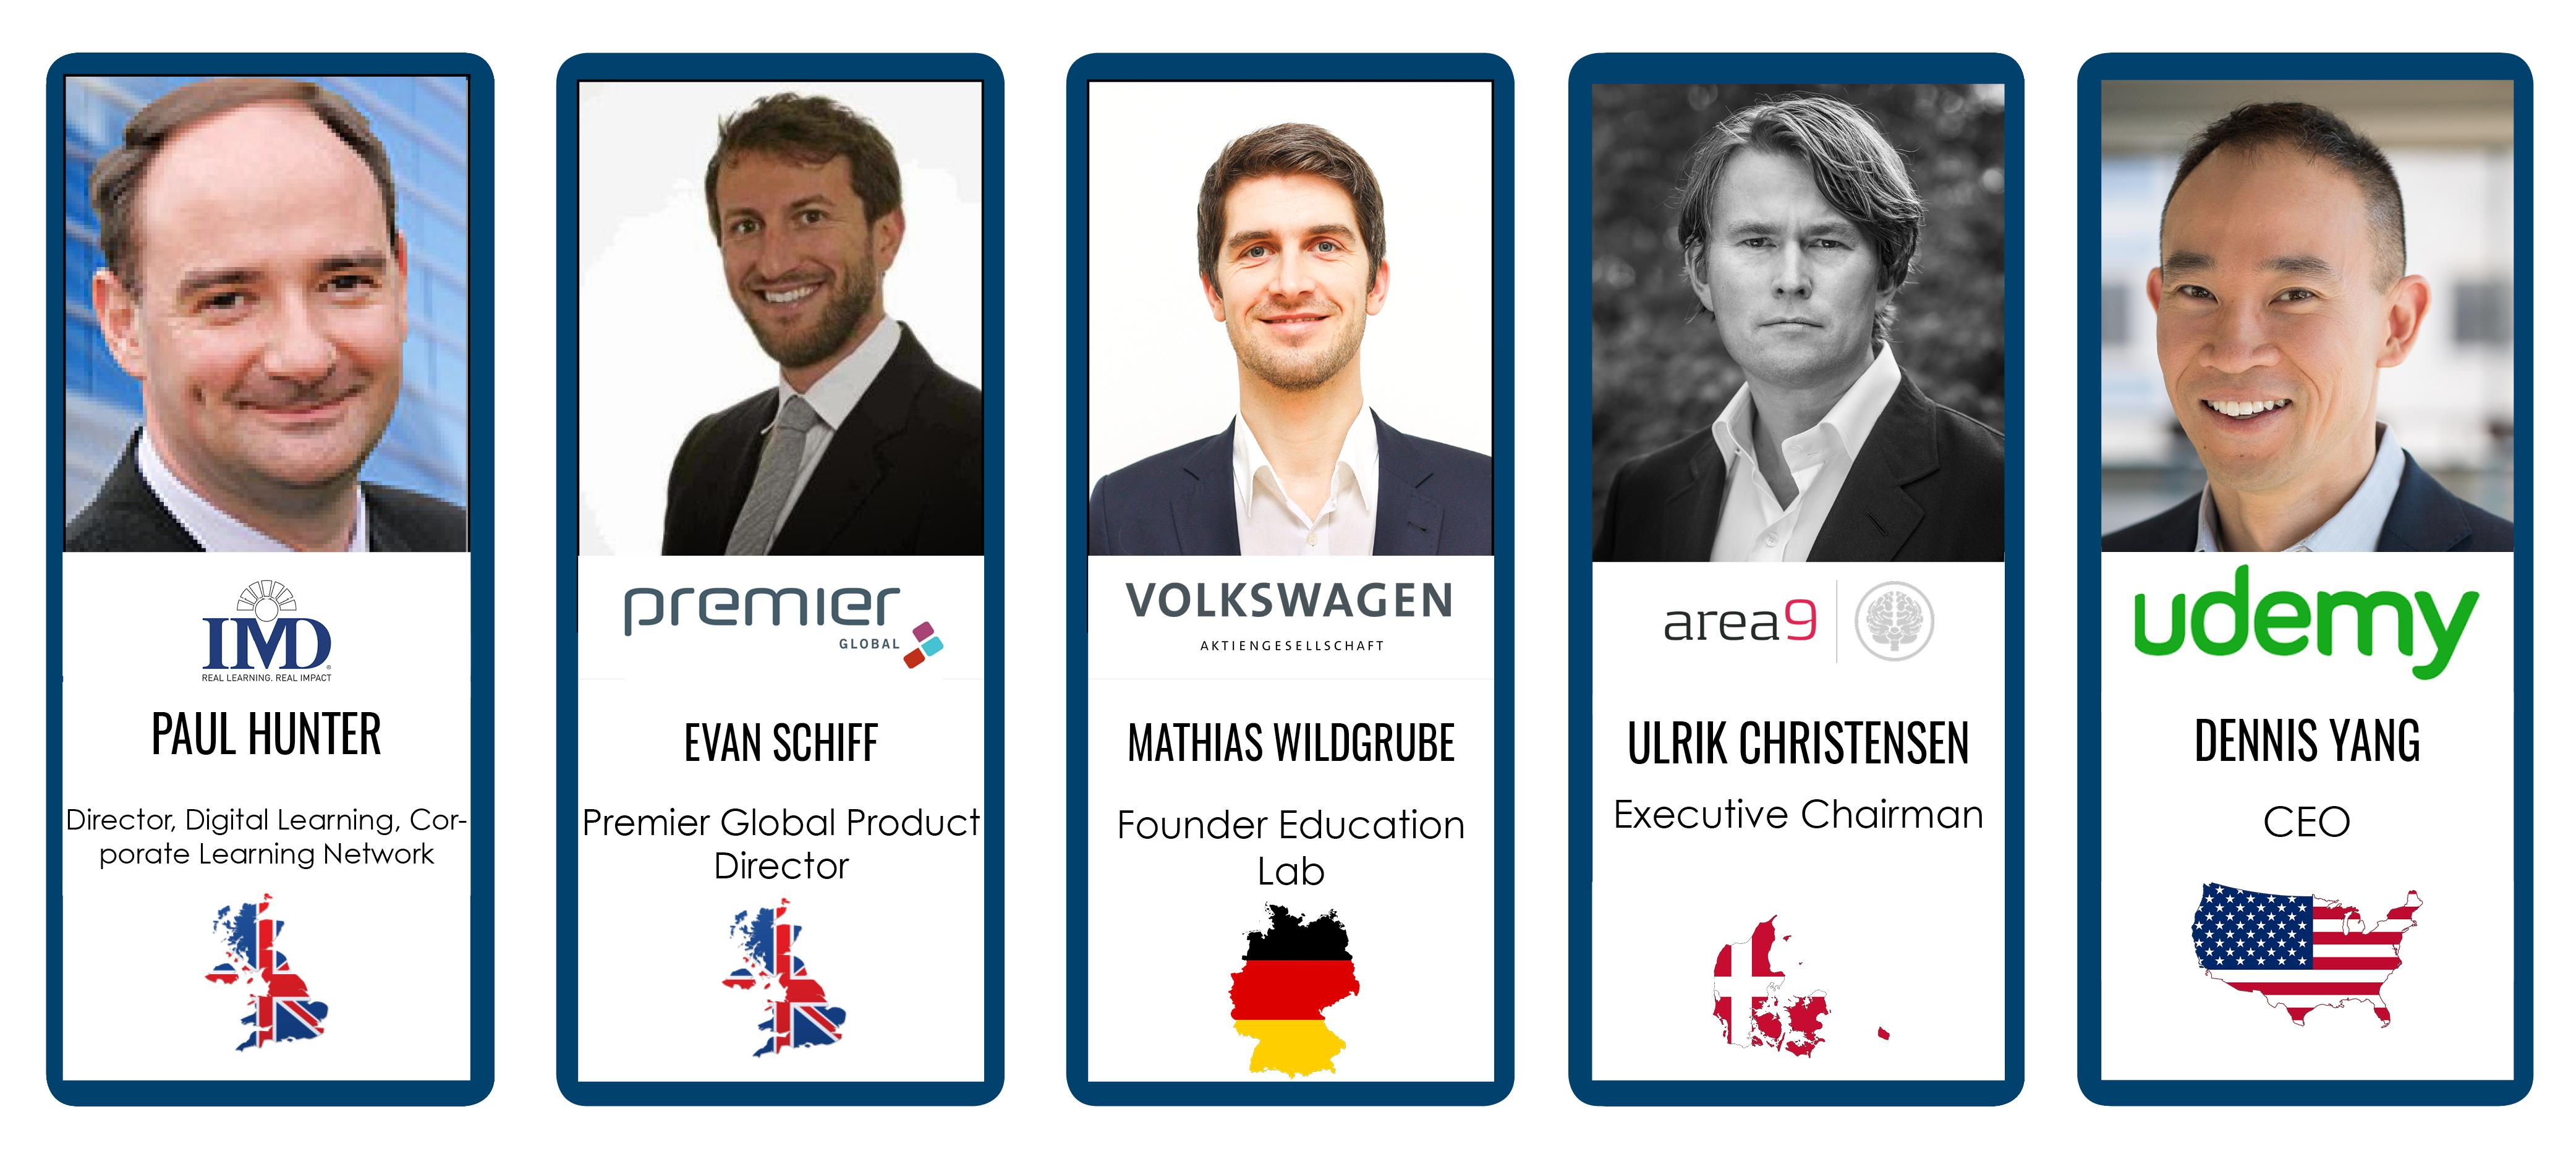 HR Tech (IMD, Premier, Volkswagen, Area9, Udemy).png